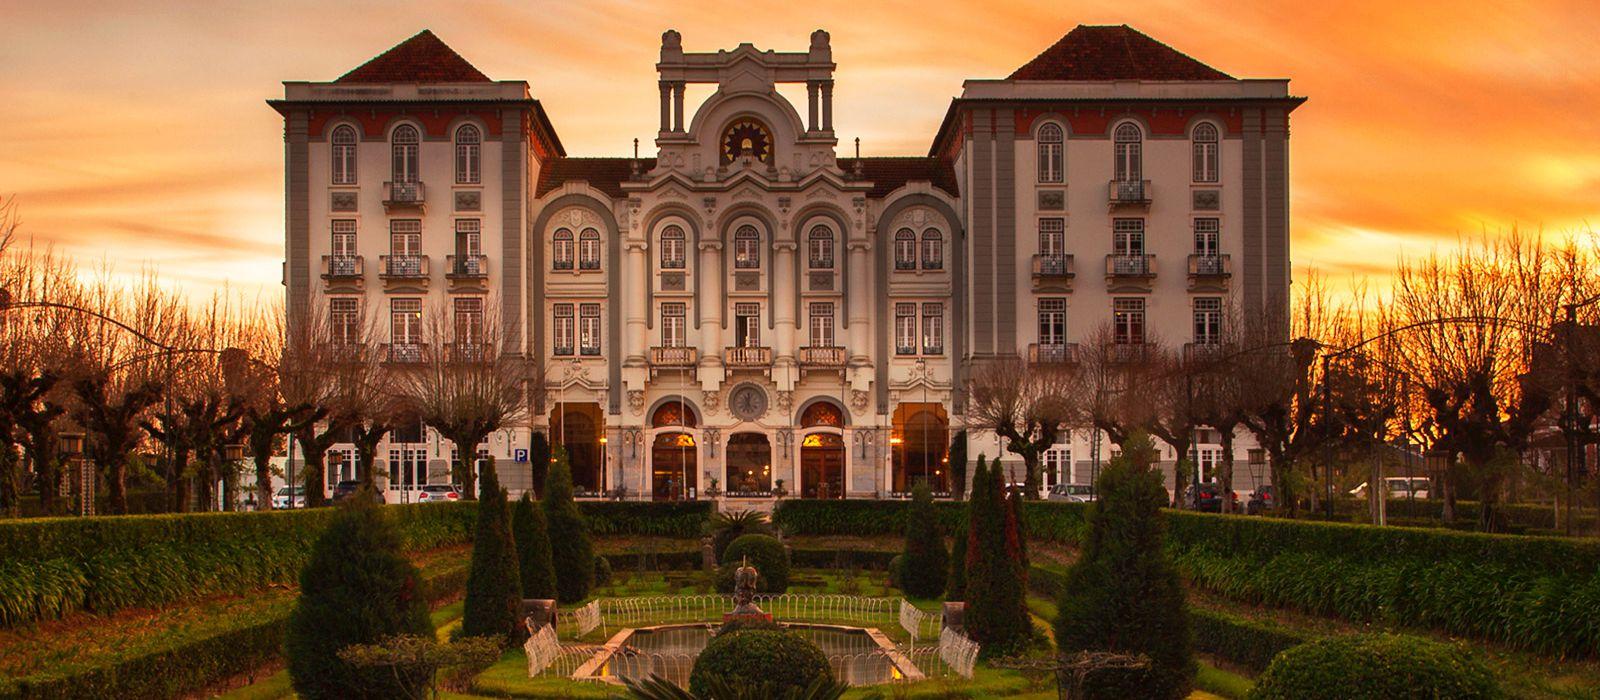 Curia Palace 01.jpg